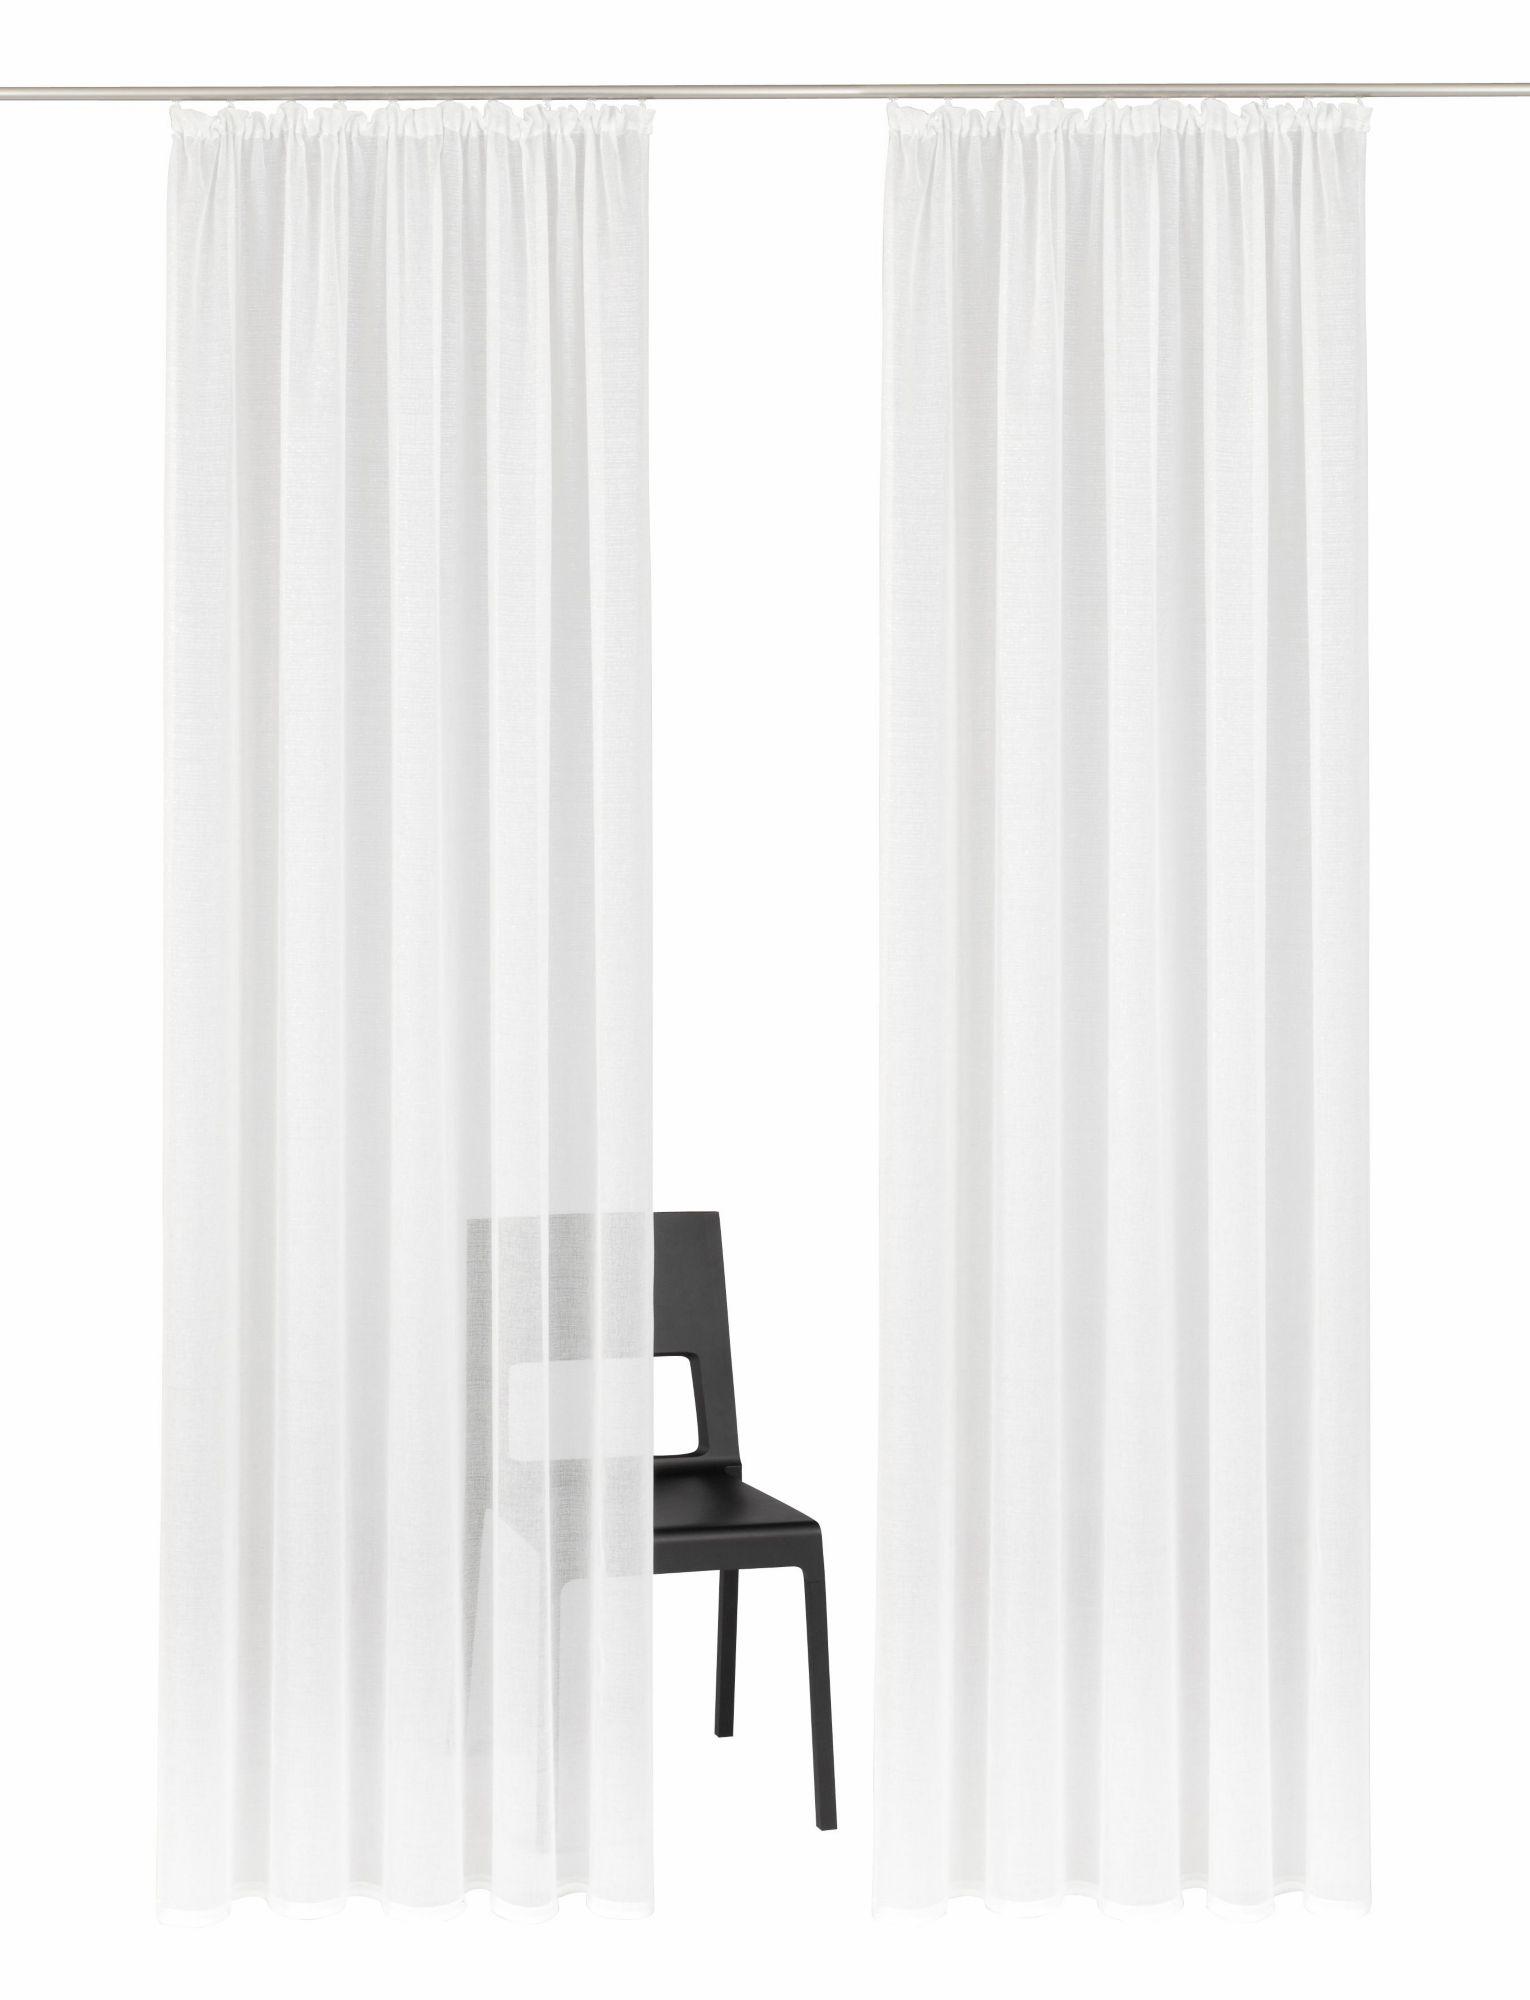 HOME AFFAIRE COLLECTION Gardine, Home affaire Collection, »Mindoro«, Kräuselband (2 Stück)